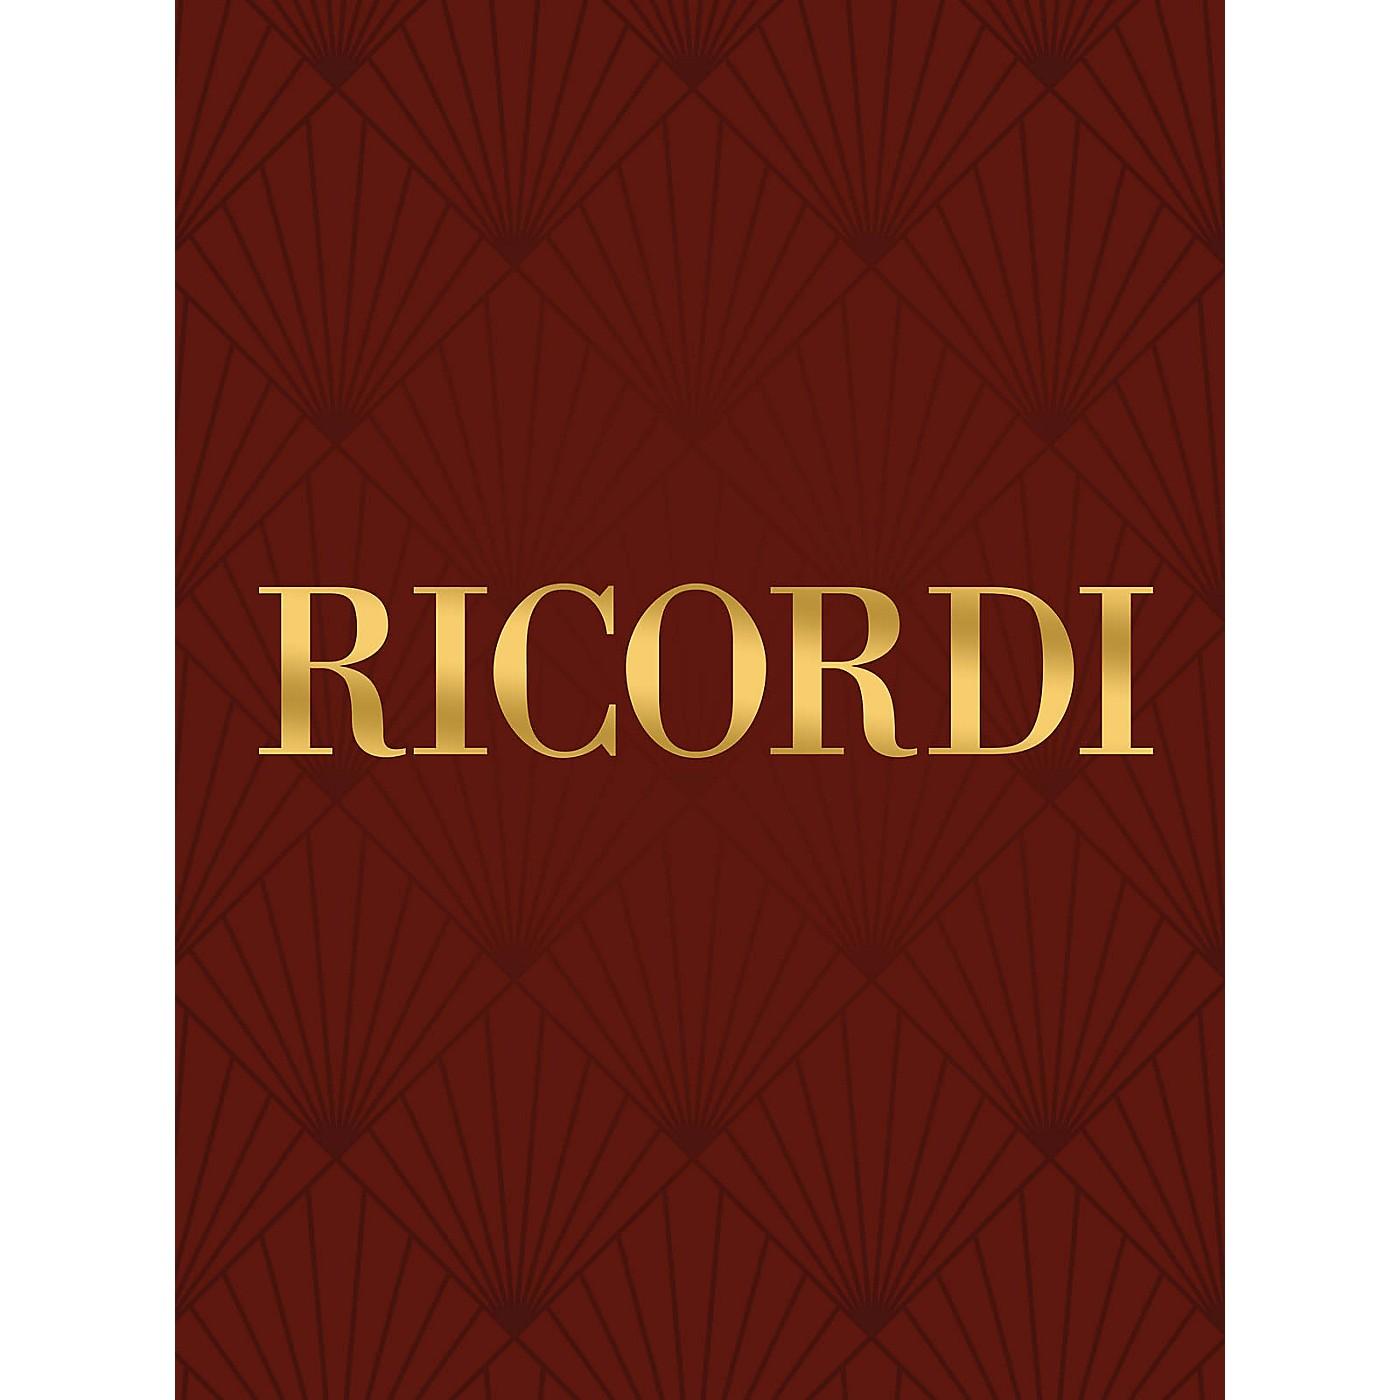 Ricordi Esercizi Giornallieri (Daily Exercises) Piano Method Composed by Carl Tausig Edited by Sigismondo Cesi thumbnail